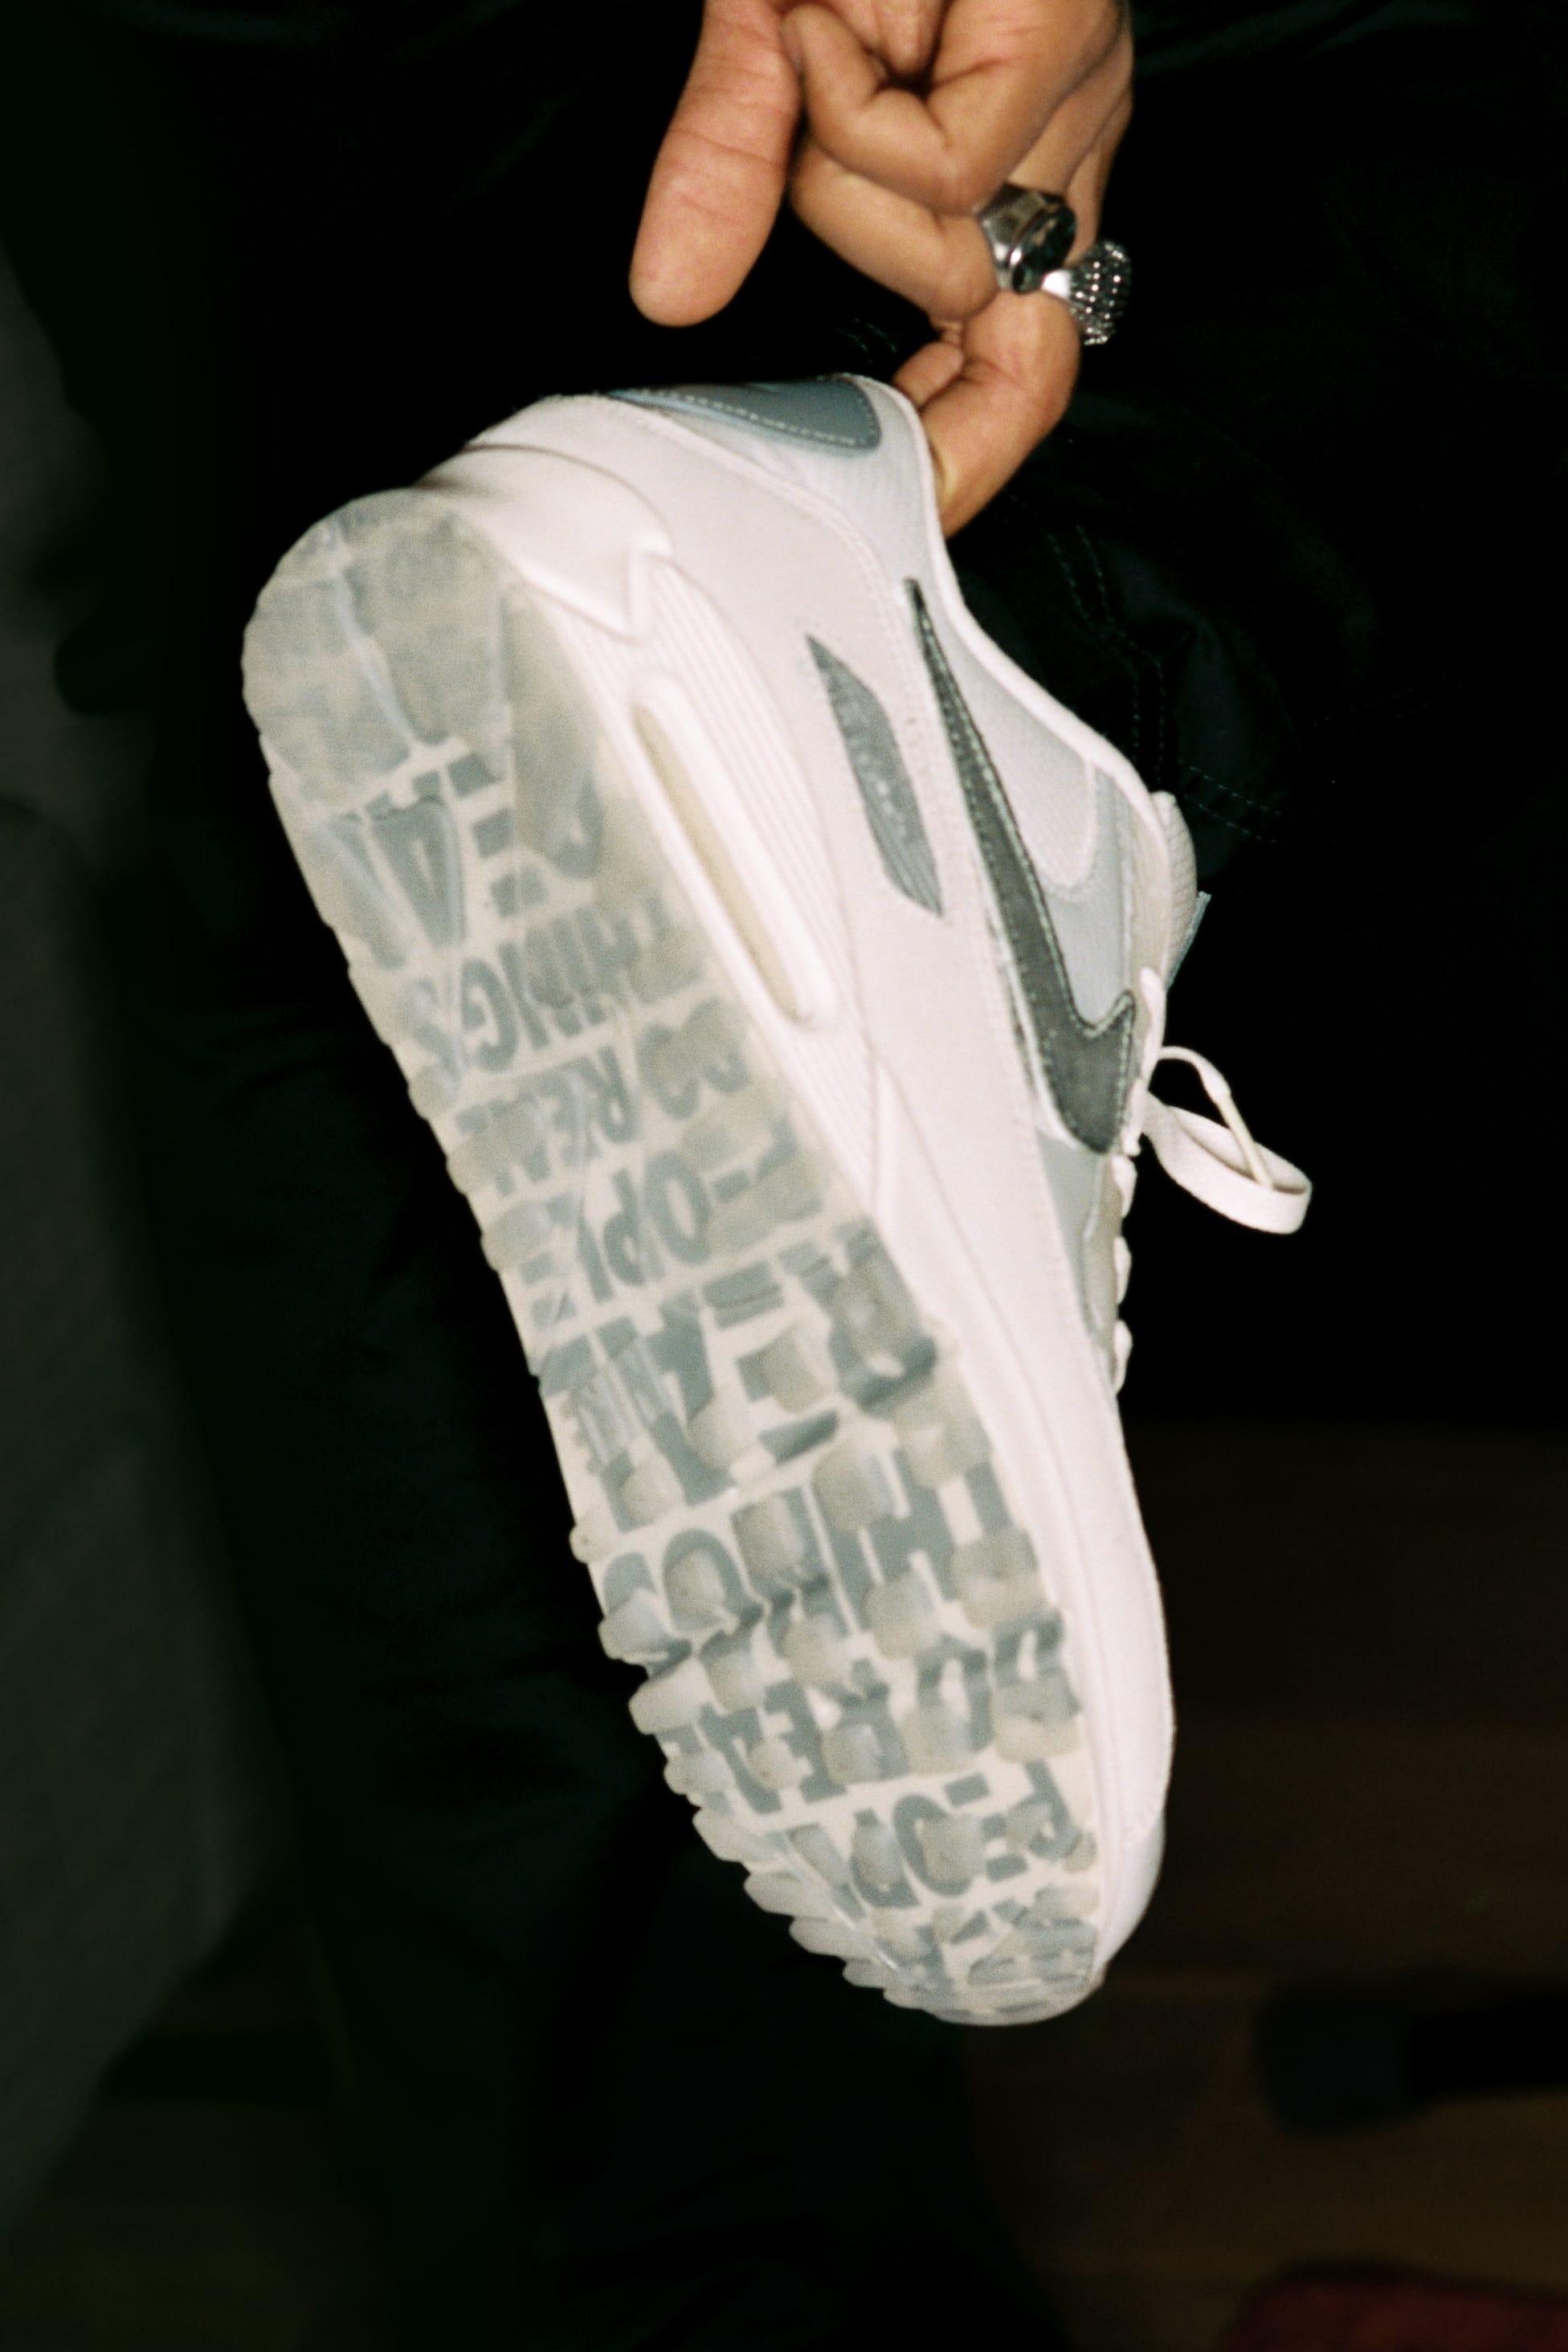 Nike x BSMNT London Air Max 90 - CI9111-002